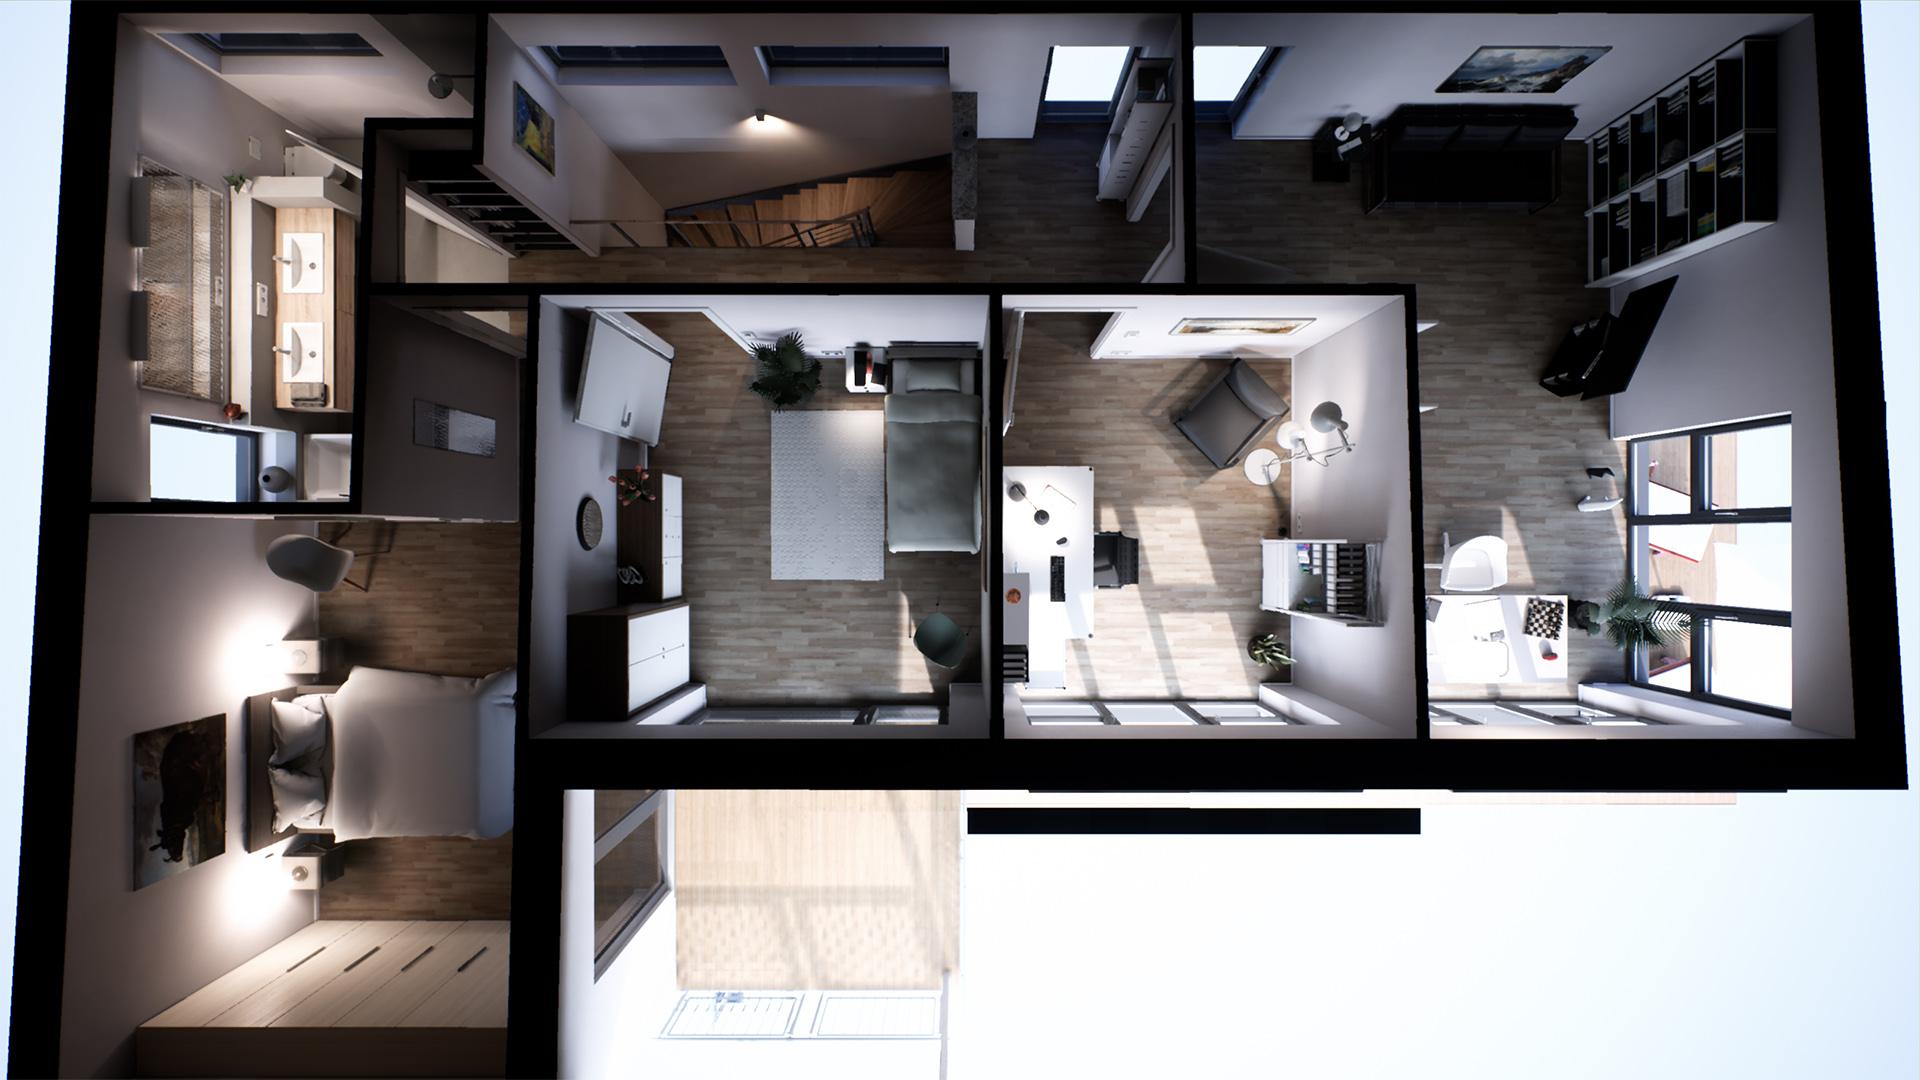 Threedee Suburban House By Threedee Gmbh In Architectural Visualization Ue4 Marketplace